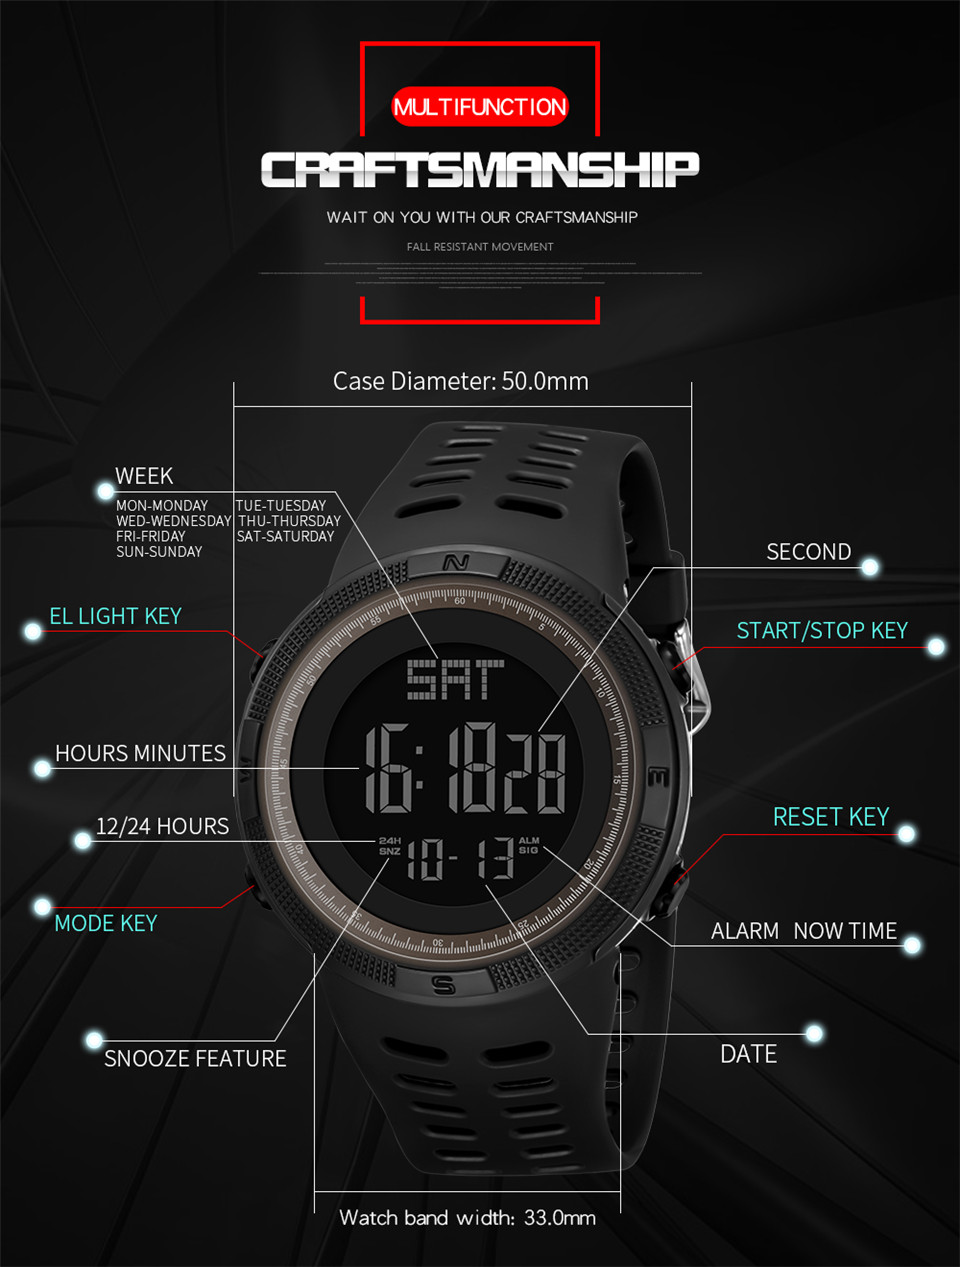 Sports Electronic Watches Men Countdown Double Time Watch Alarm Chrono Digital Wristwatches 50M Waterproof Outdoor Running Watch (4)